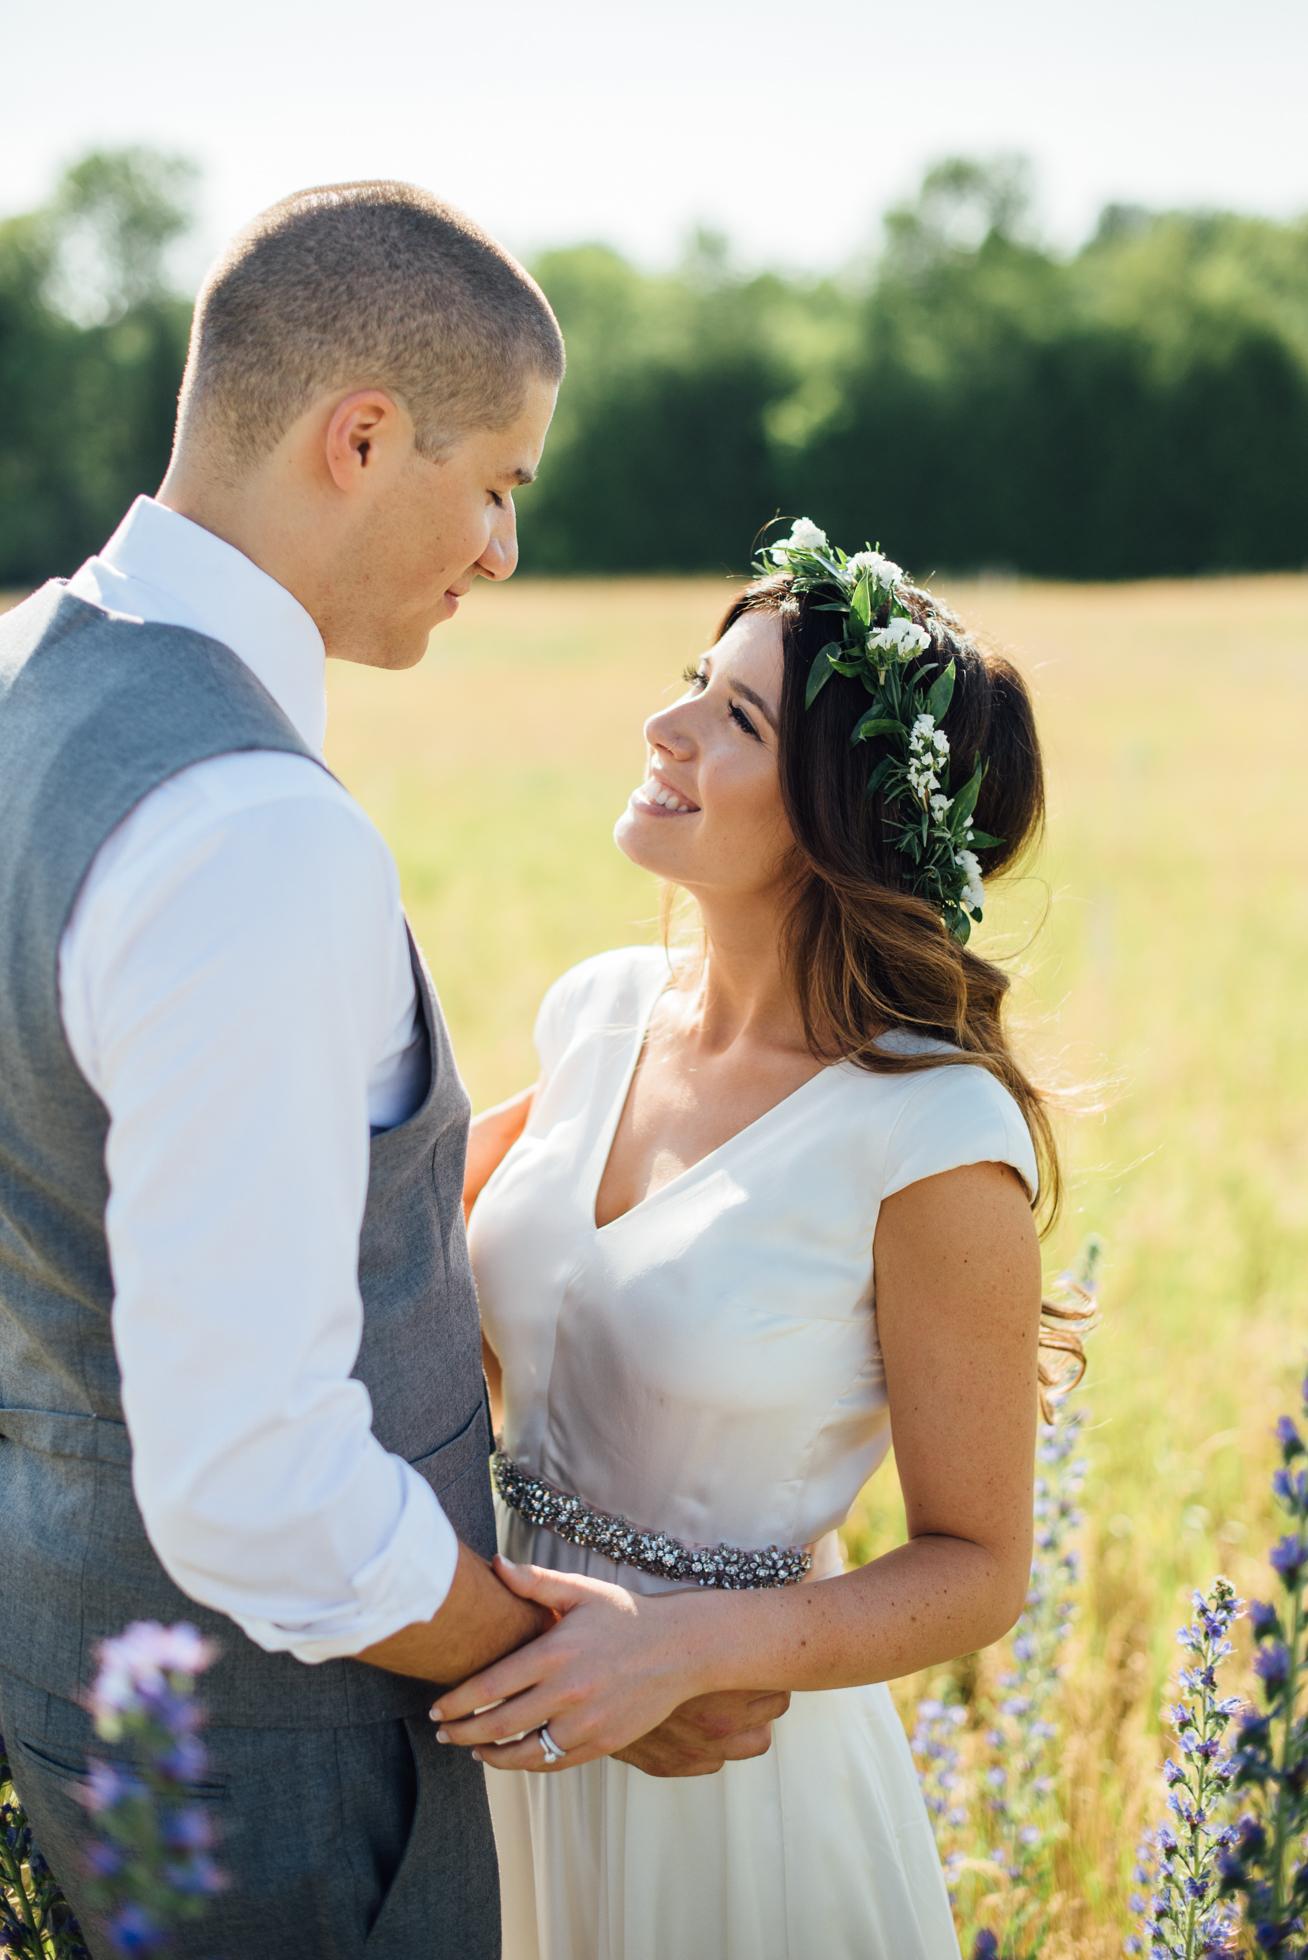 Downswell-Barn-Wedding-Photography-76.jpg